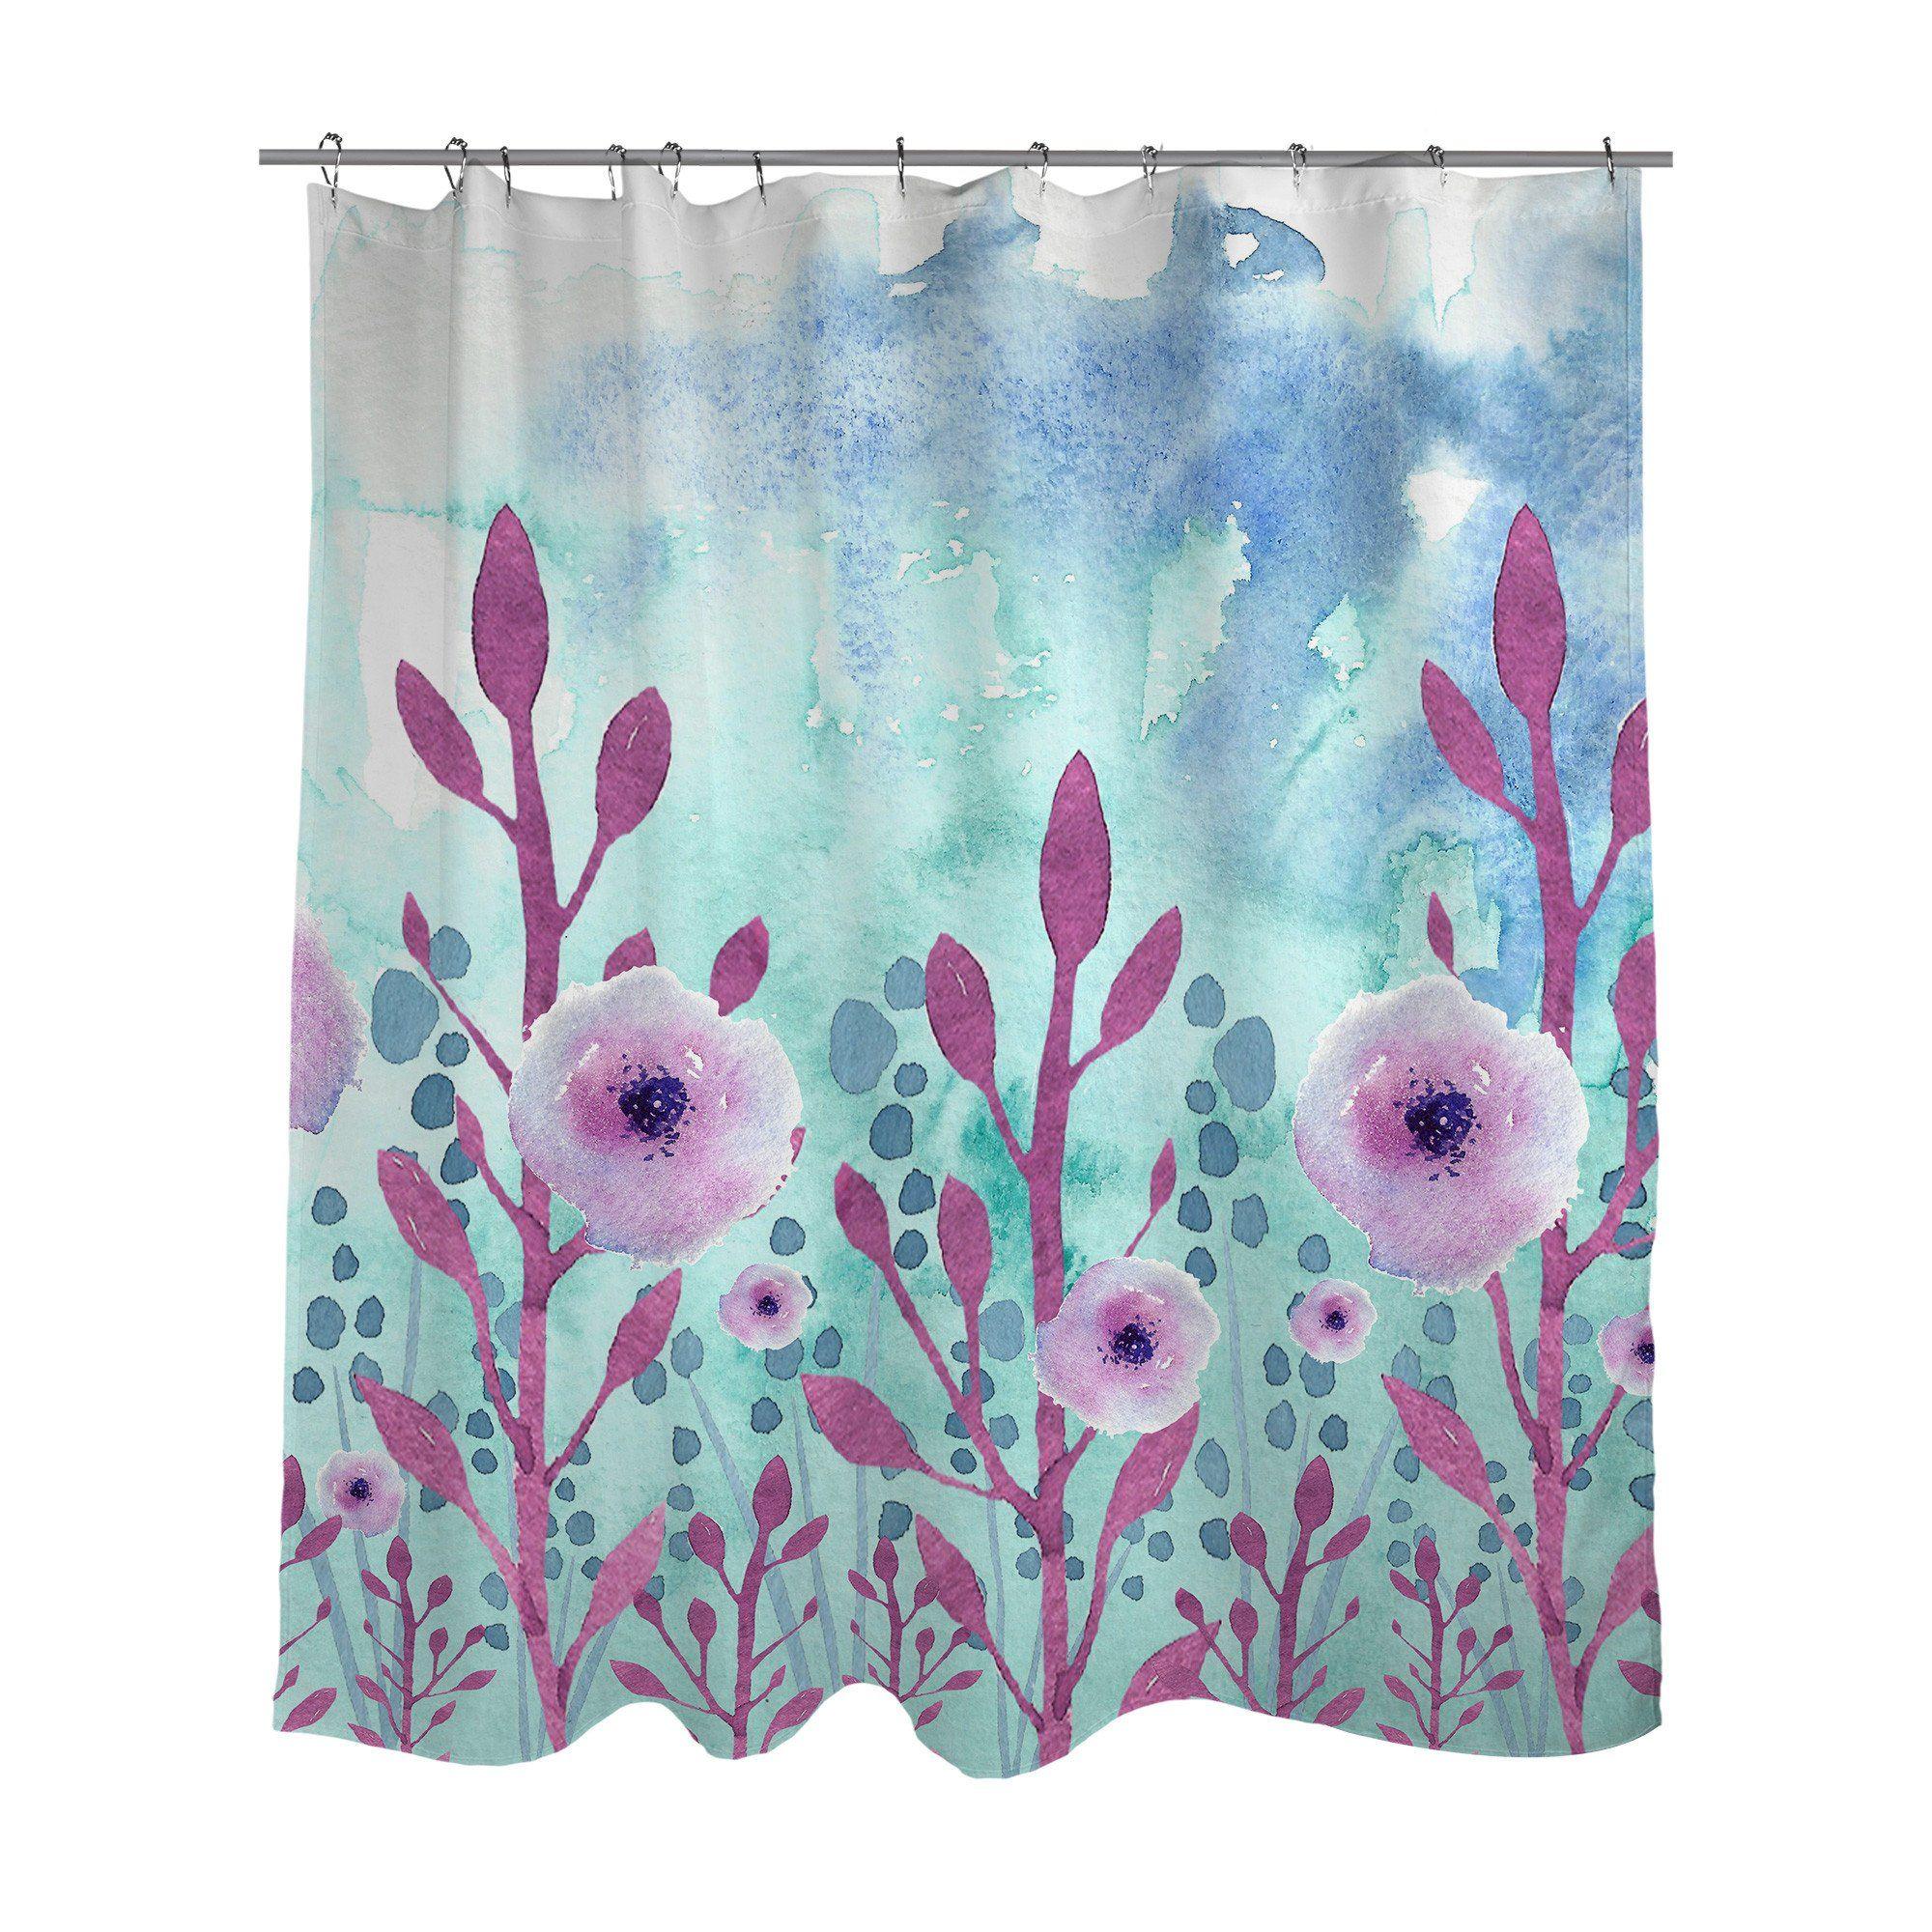 Shower curtain pink pansy original art by elderbrook studio